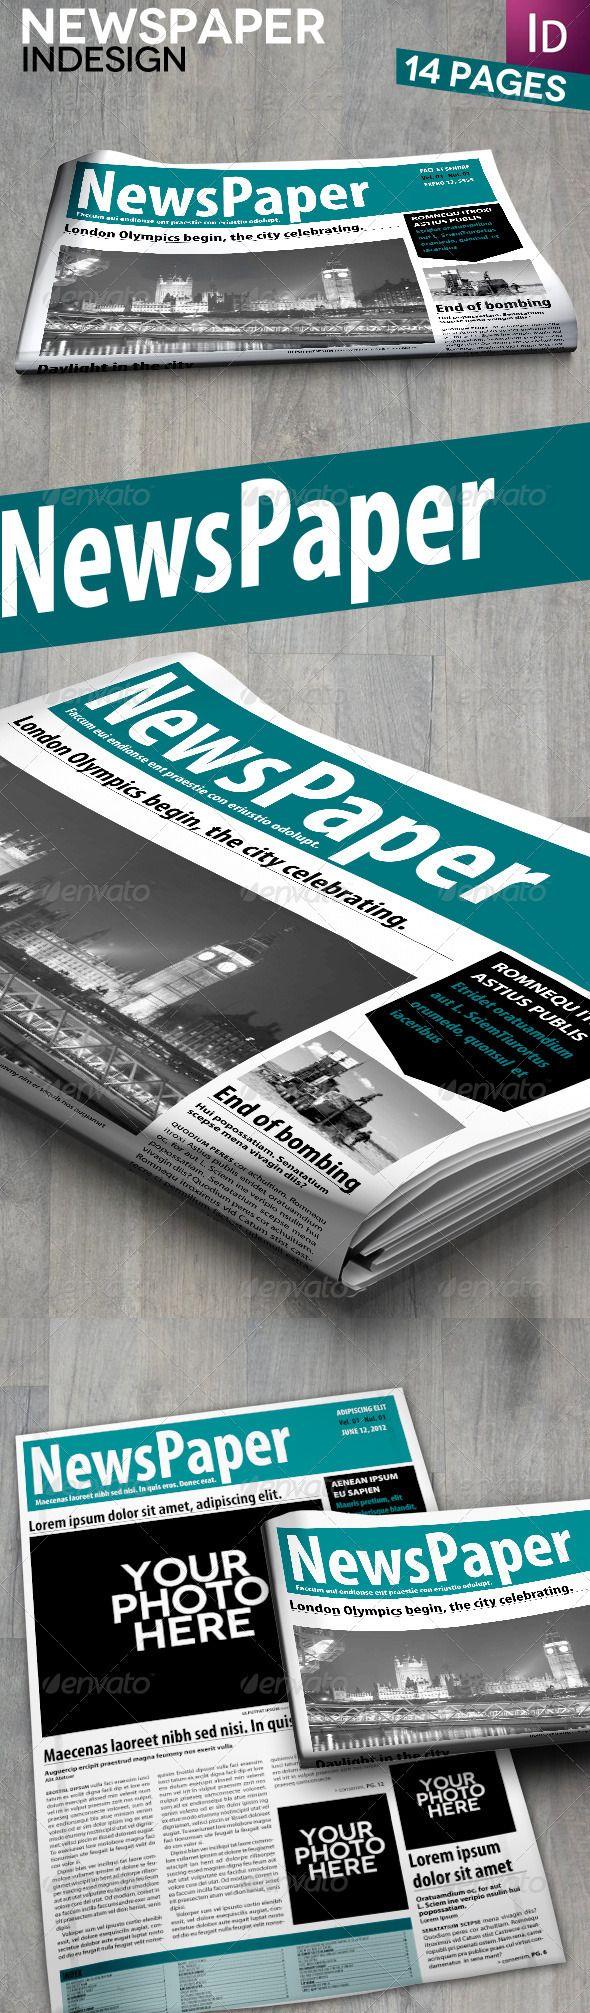 11 best Magazine images on Pinterest | Brochures, Adobe indesign and ...